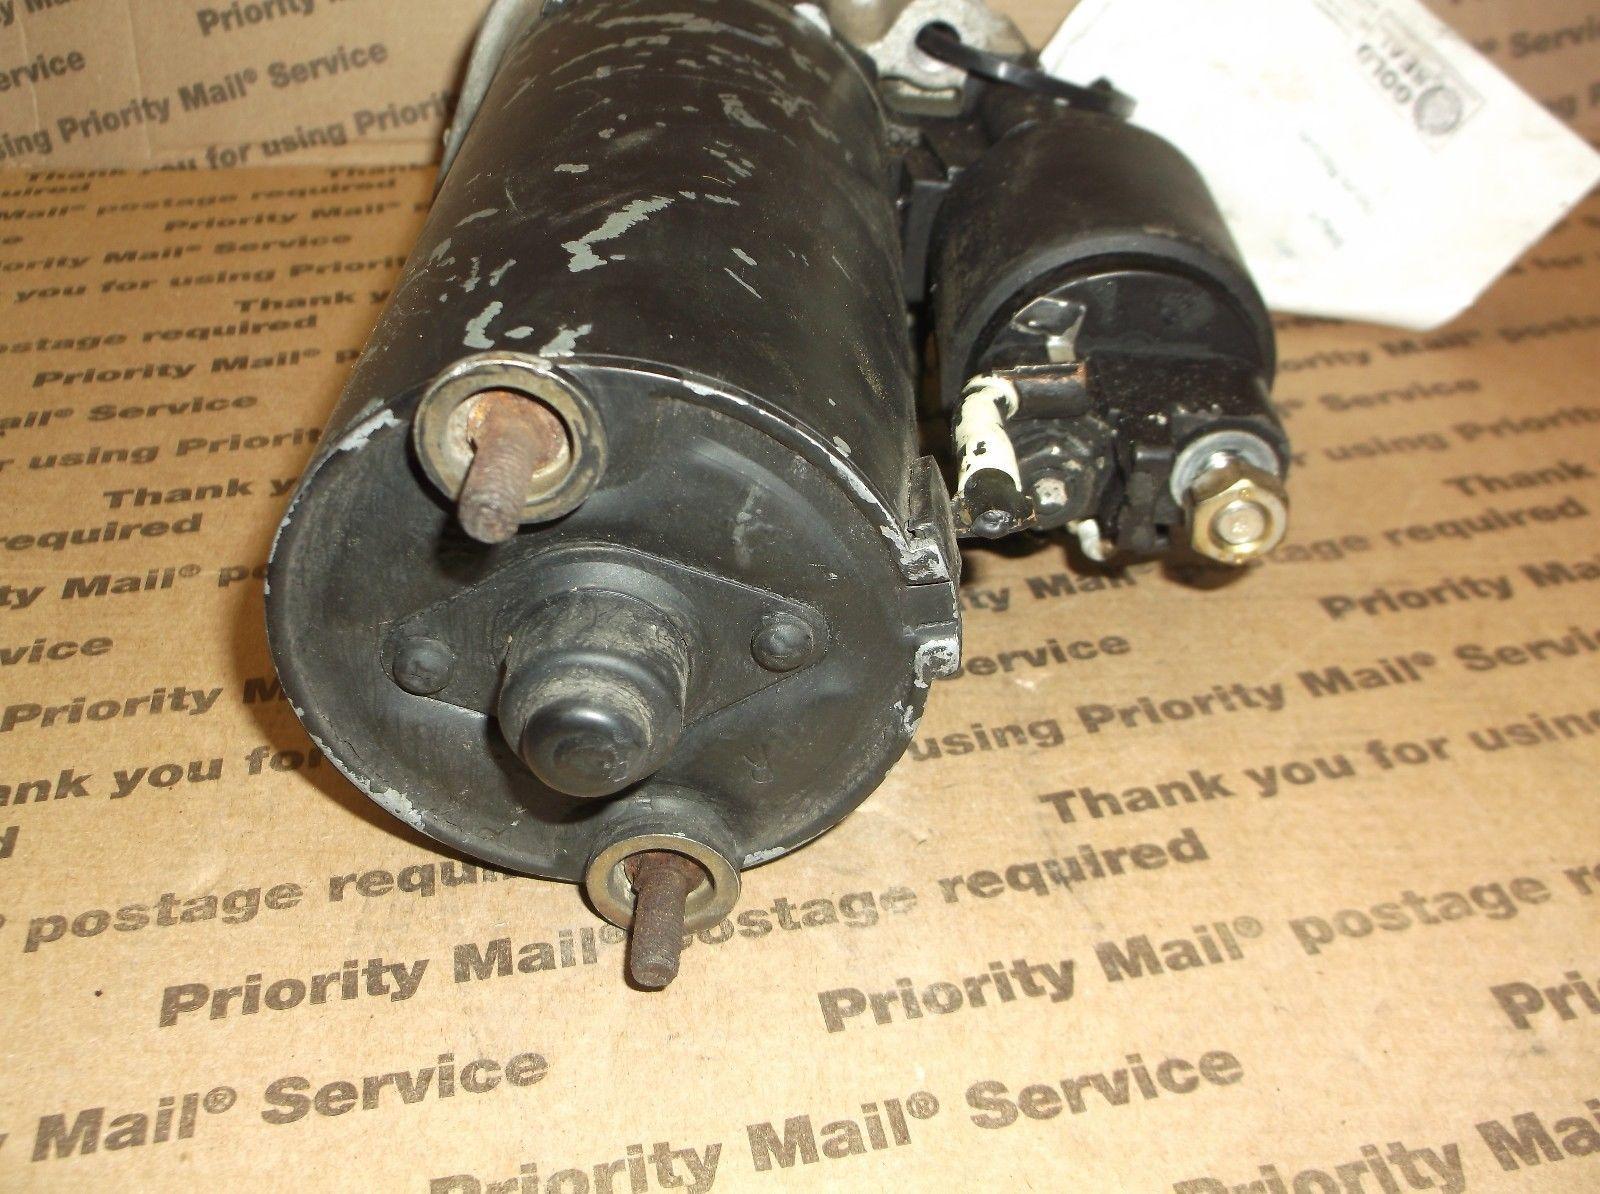 94 95 96 97 mercedes benz e320 sl320 type 210 bosch engine for 95 mercedes benz e320